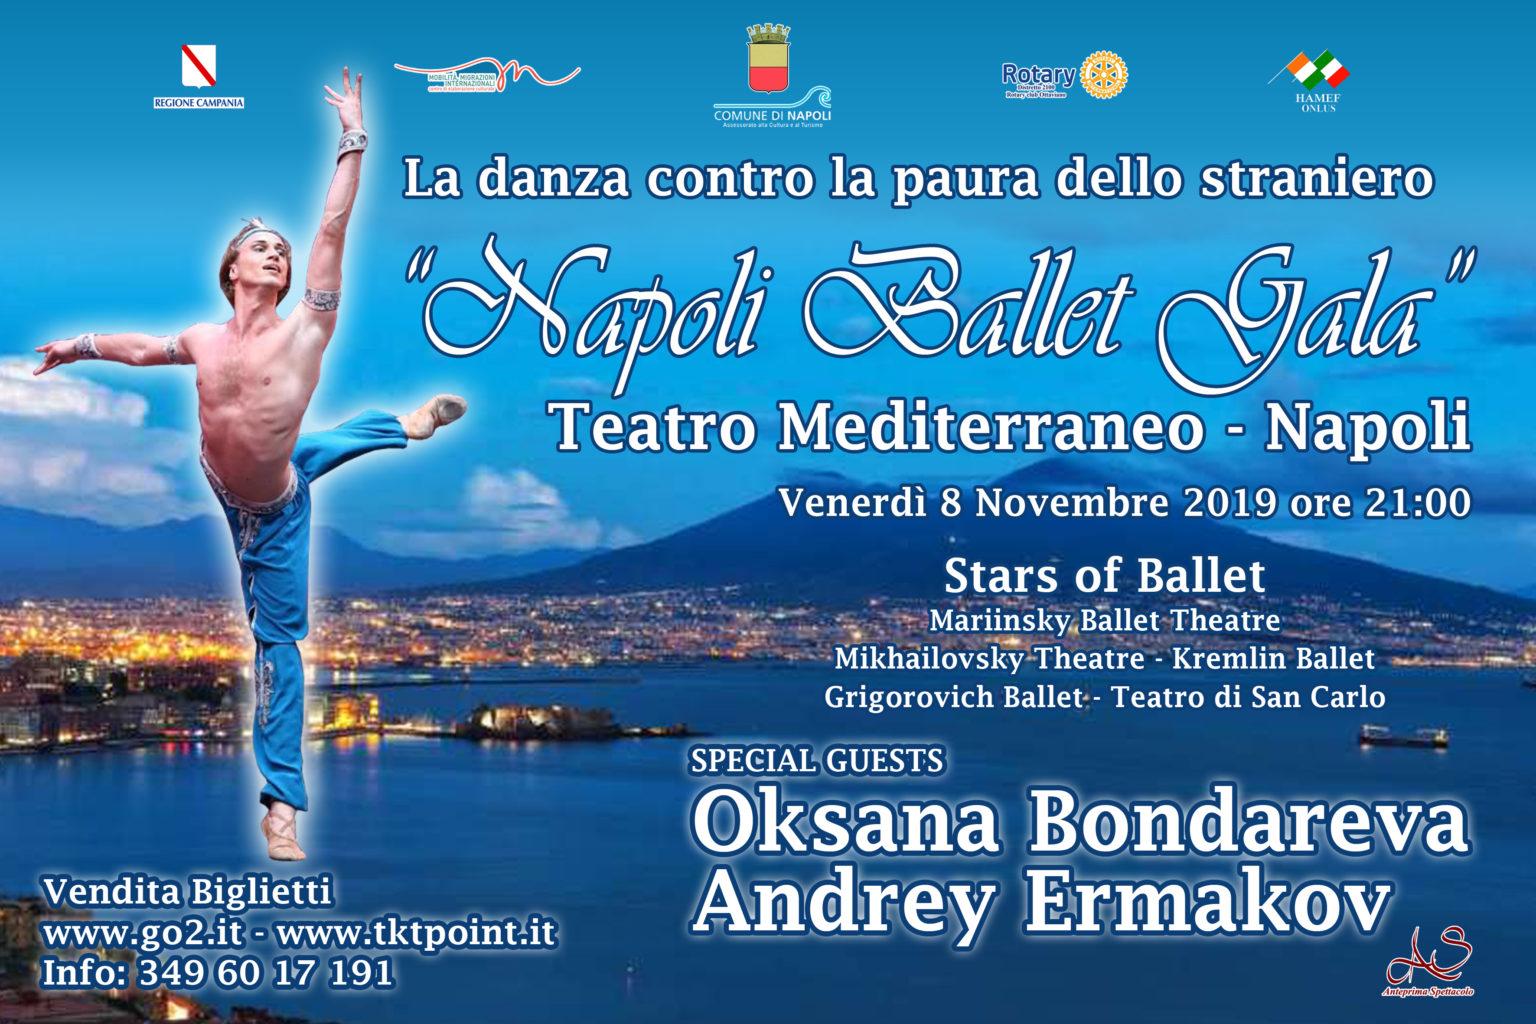 Napoli Ballet Gala - Teatro Mediterraneo